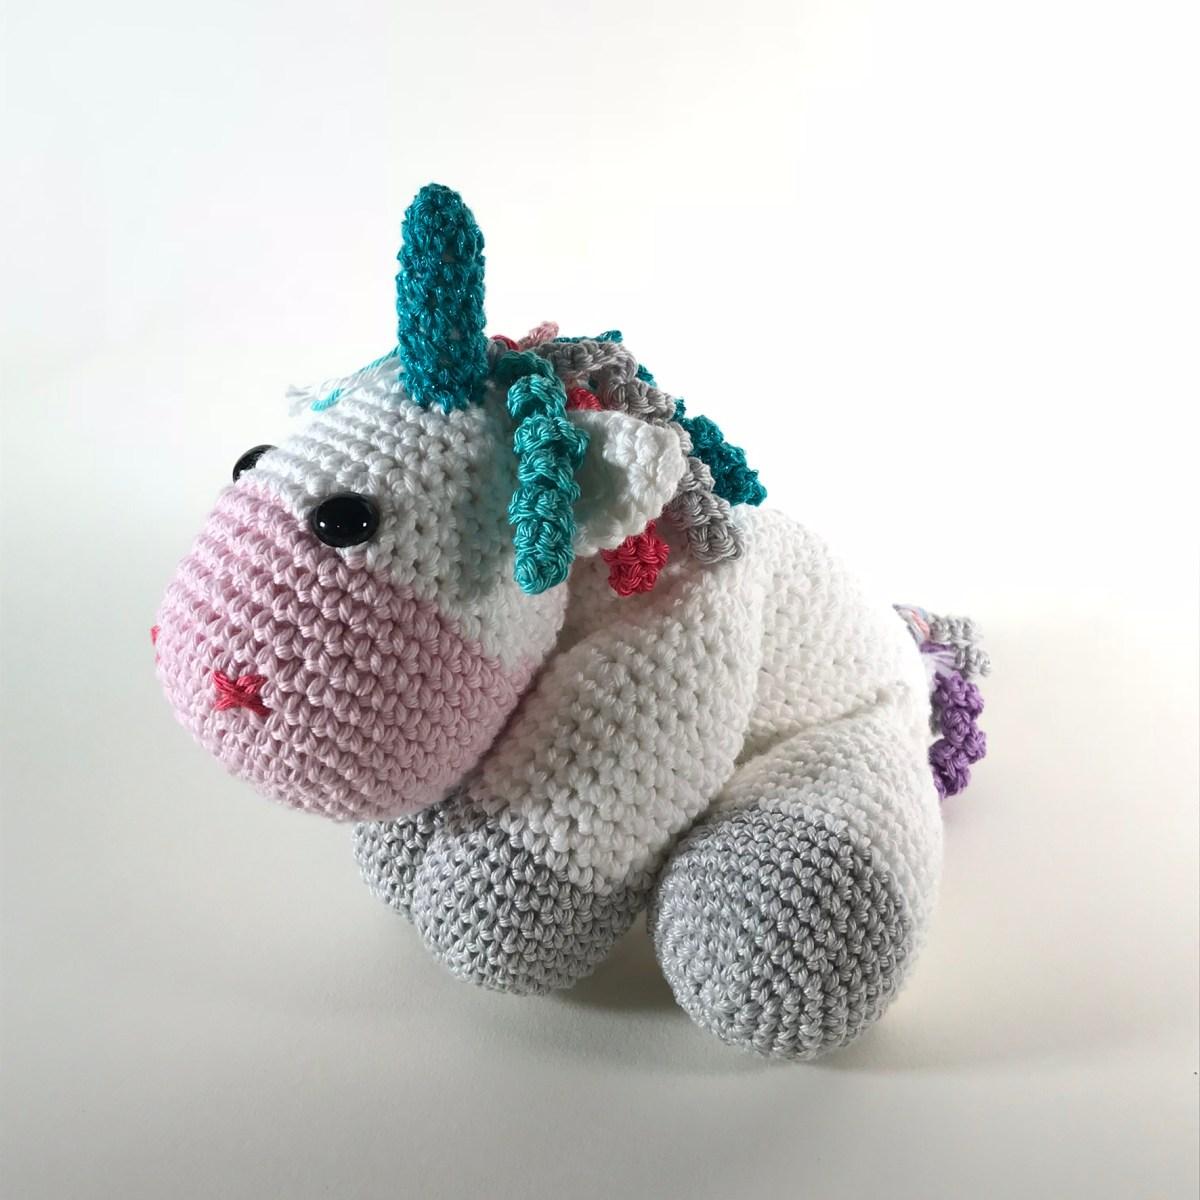 Dada Neon Crochet: Tiny Rainbow Unicorn Amigurumi by Ahooka - As a ... | 1200x1200